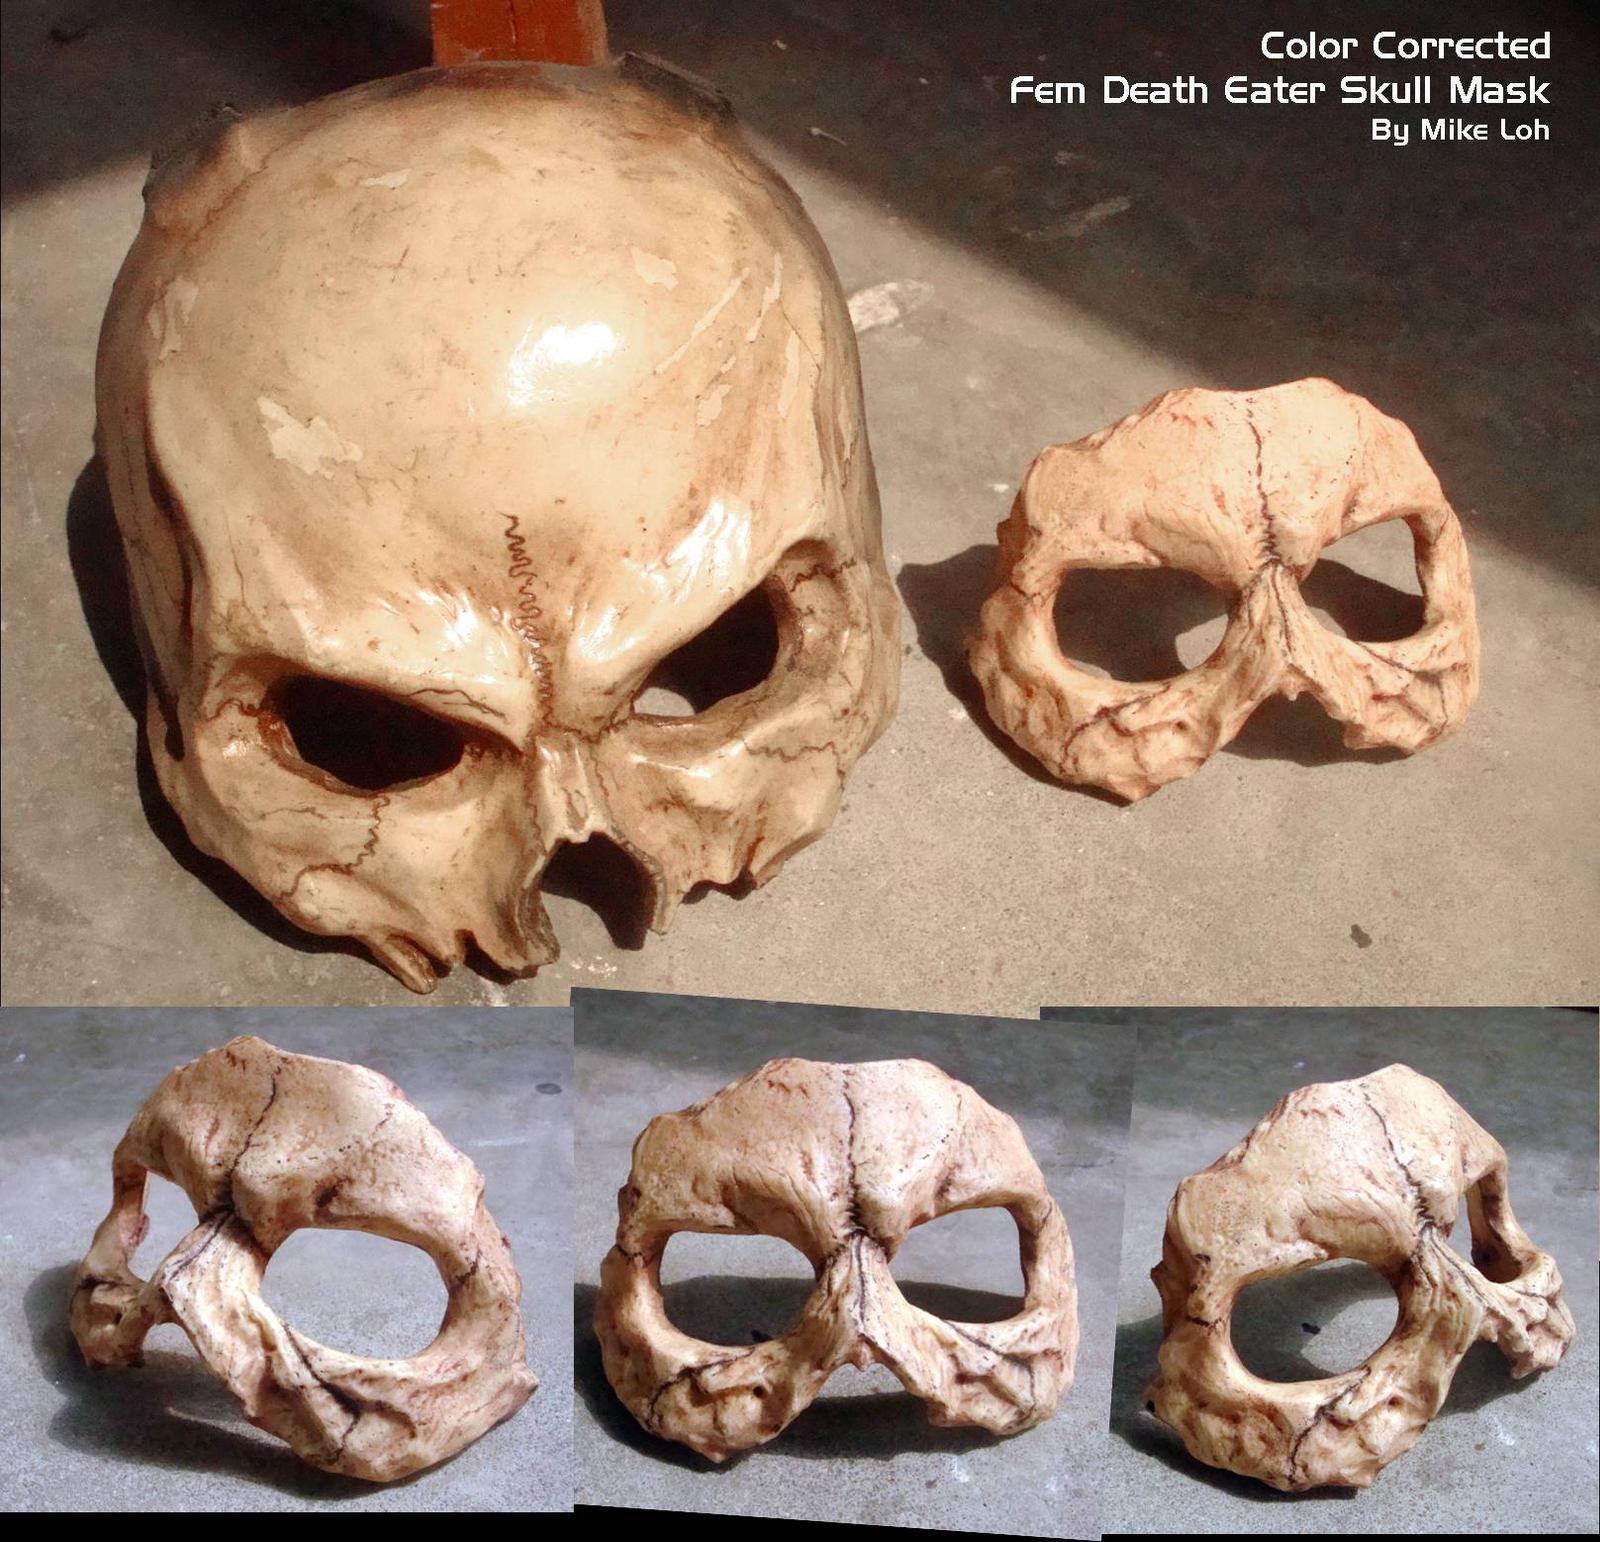 Color corrected skull by uratz studios on deviantart - Uratz studios ...